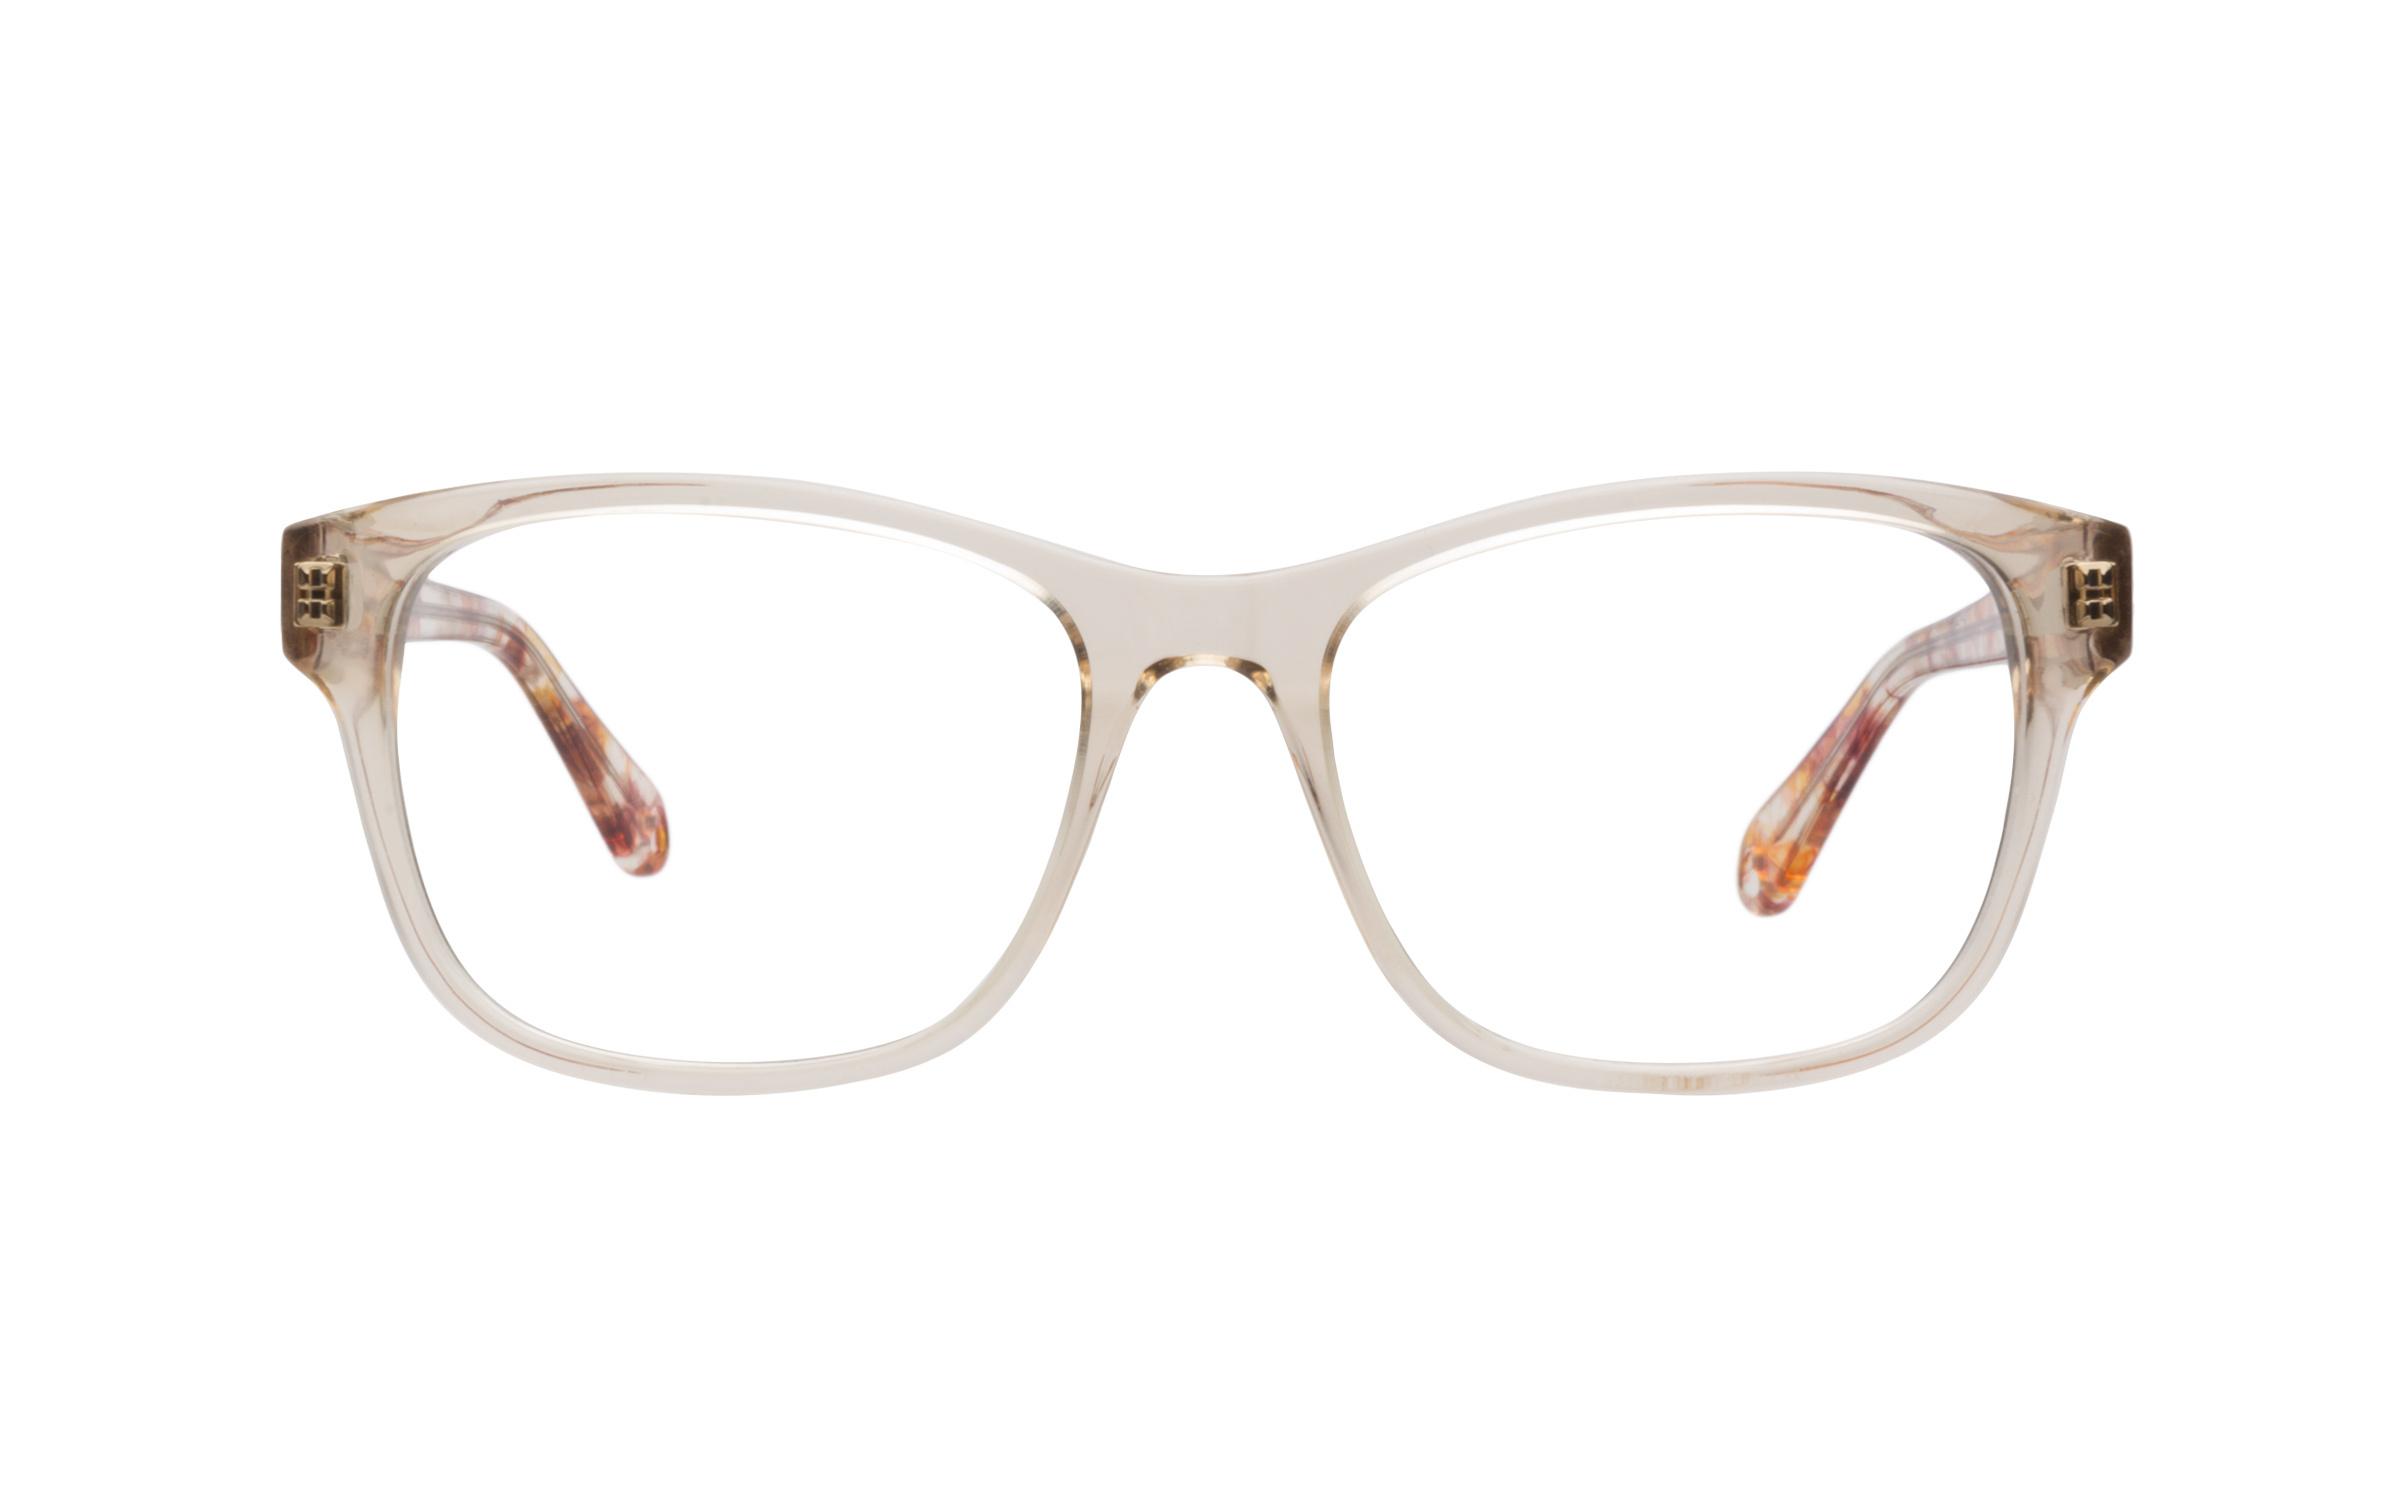 Womens_Retro_Glasses_BrownClearPink_Love_Online_Coastal